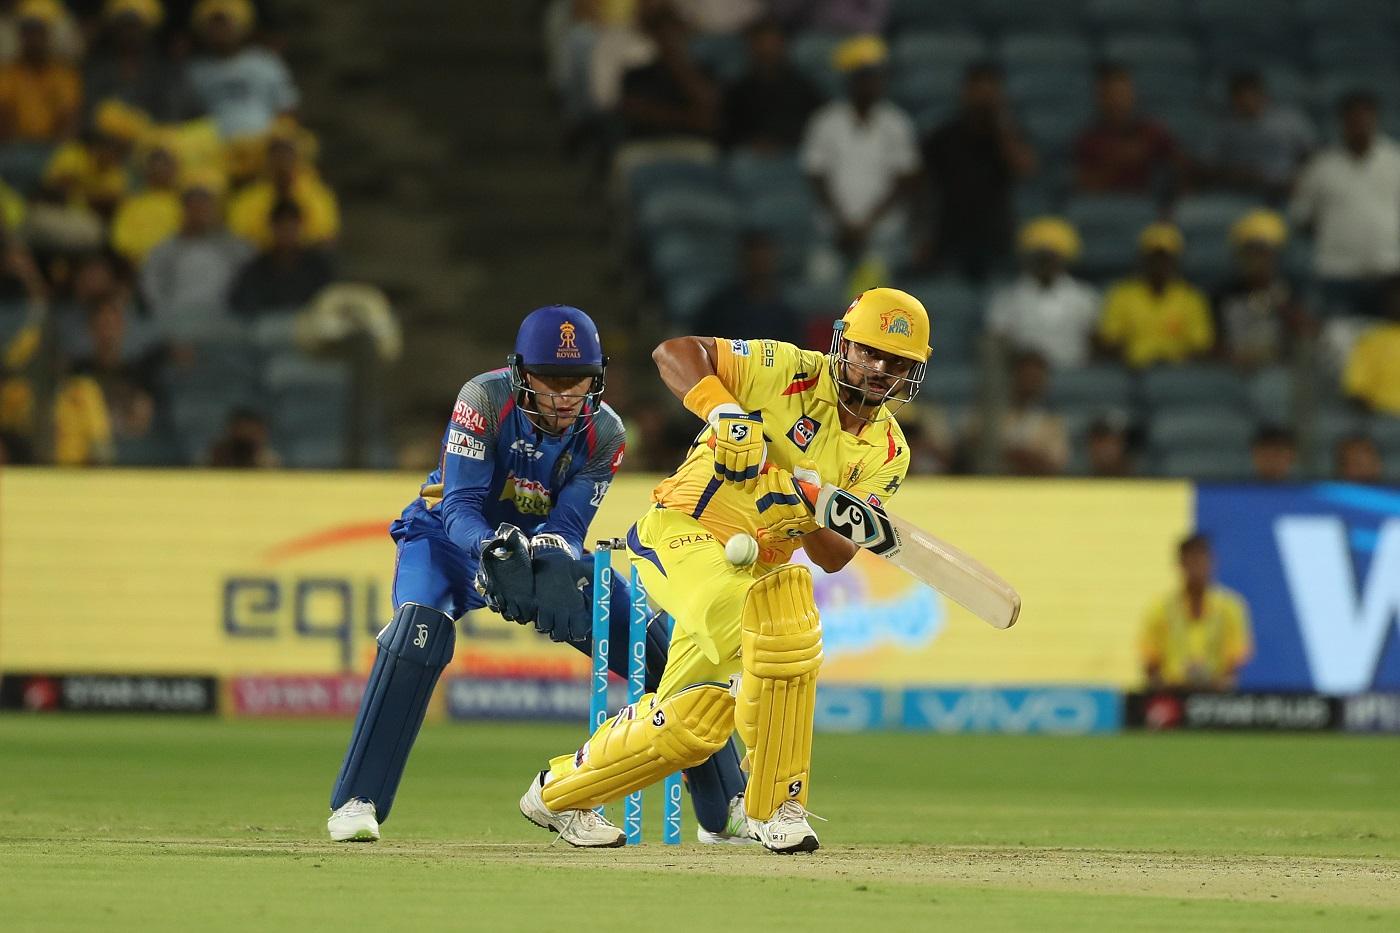 IPL 2018: Suresh Raina Enjoys Travelling With Sakshi Dhoni